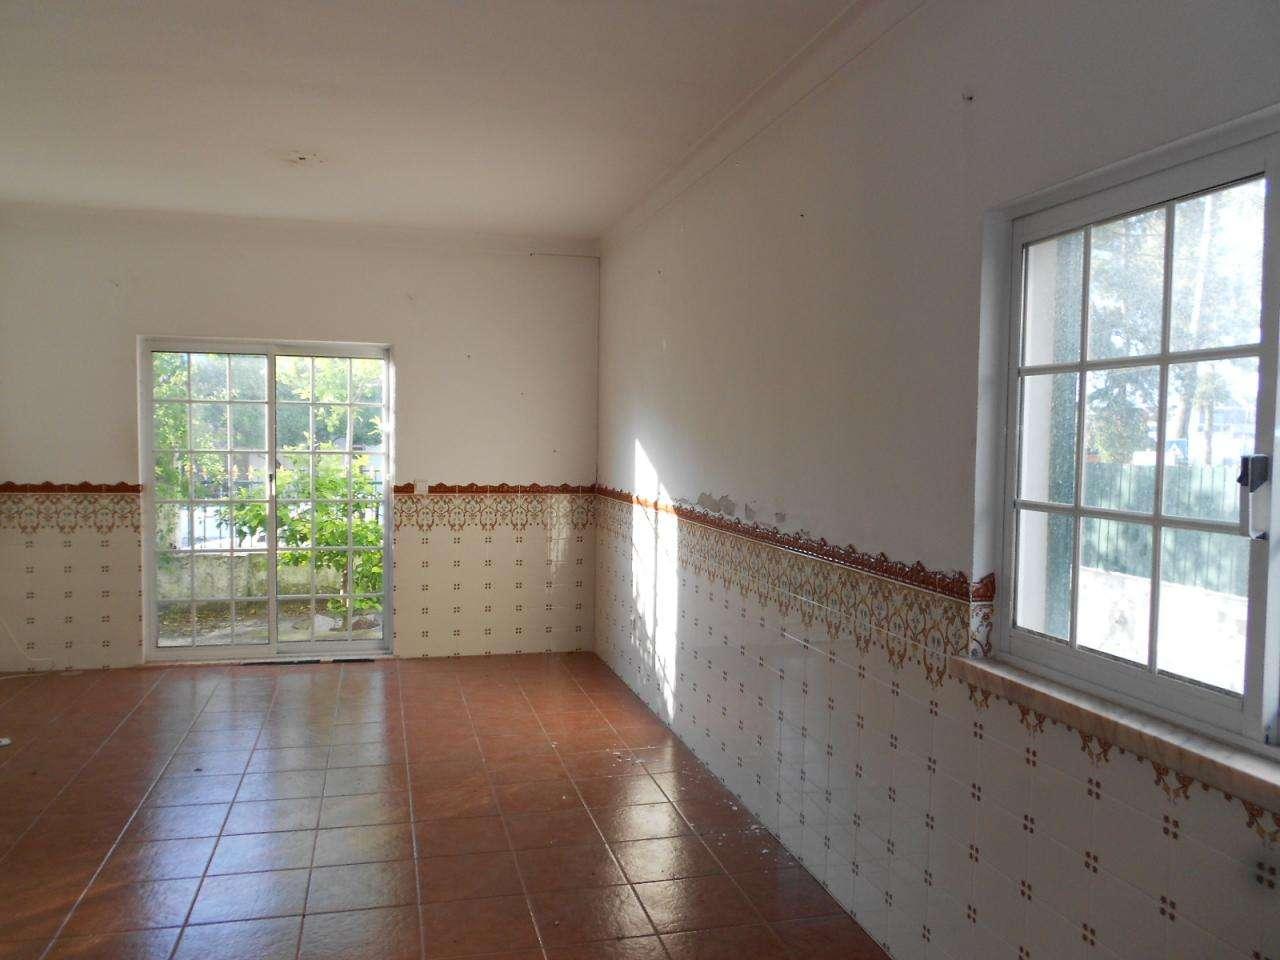 Moradia para comprar, Quinta do Conde, Setúbal - Foto 4